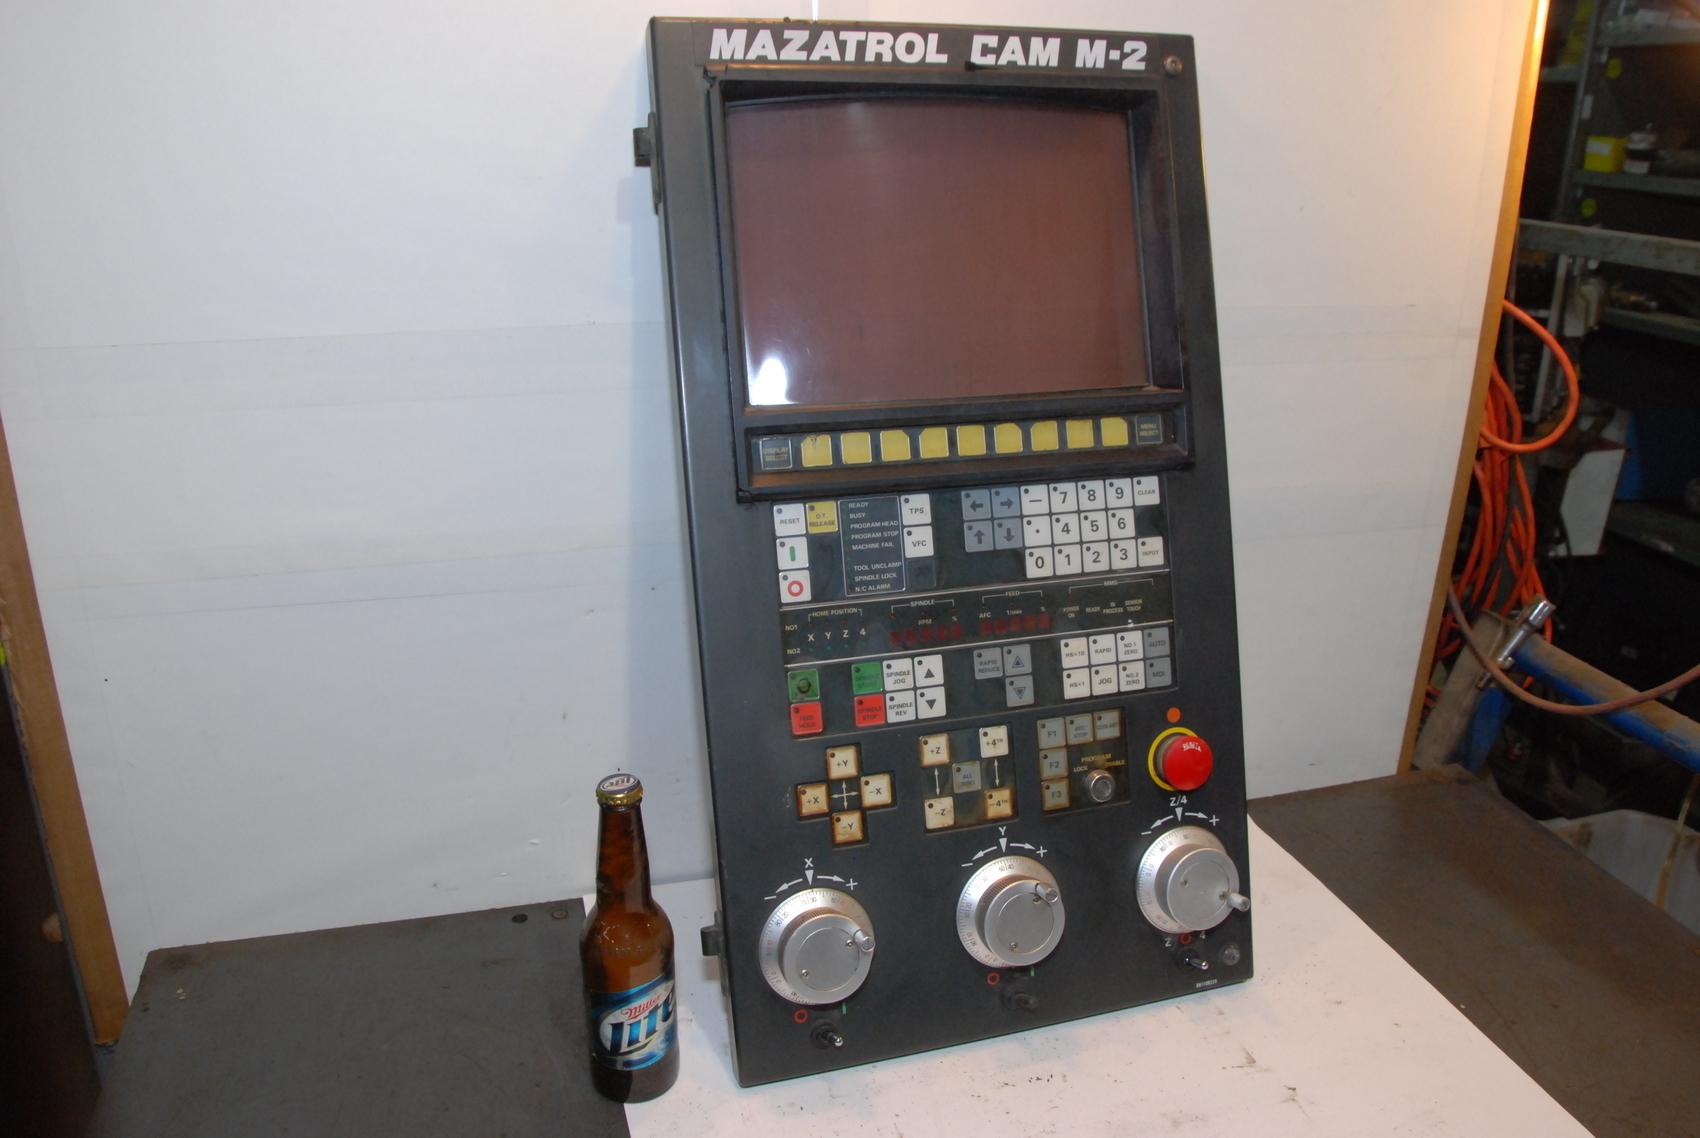 MAZATROL CAM M-2 CONTROL INTERFACE STATION